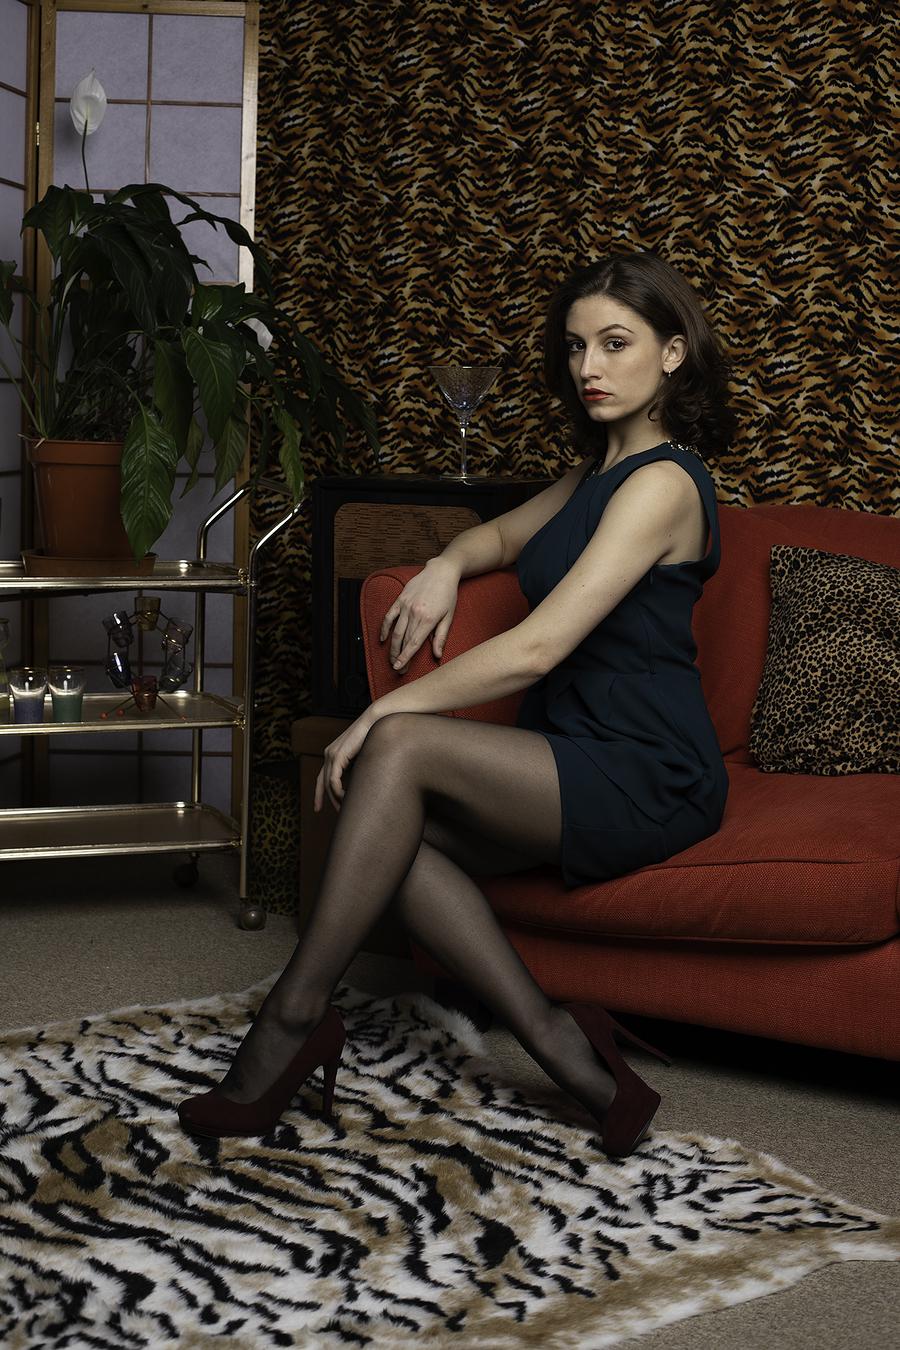 Looking elegant in the lounge / Photography by Inspire Studios Ltd, Model BOou, Taken at Inspire Studios Ltd / Uploaded 12th April 2019 @ 08:58 PM